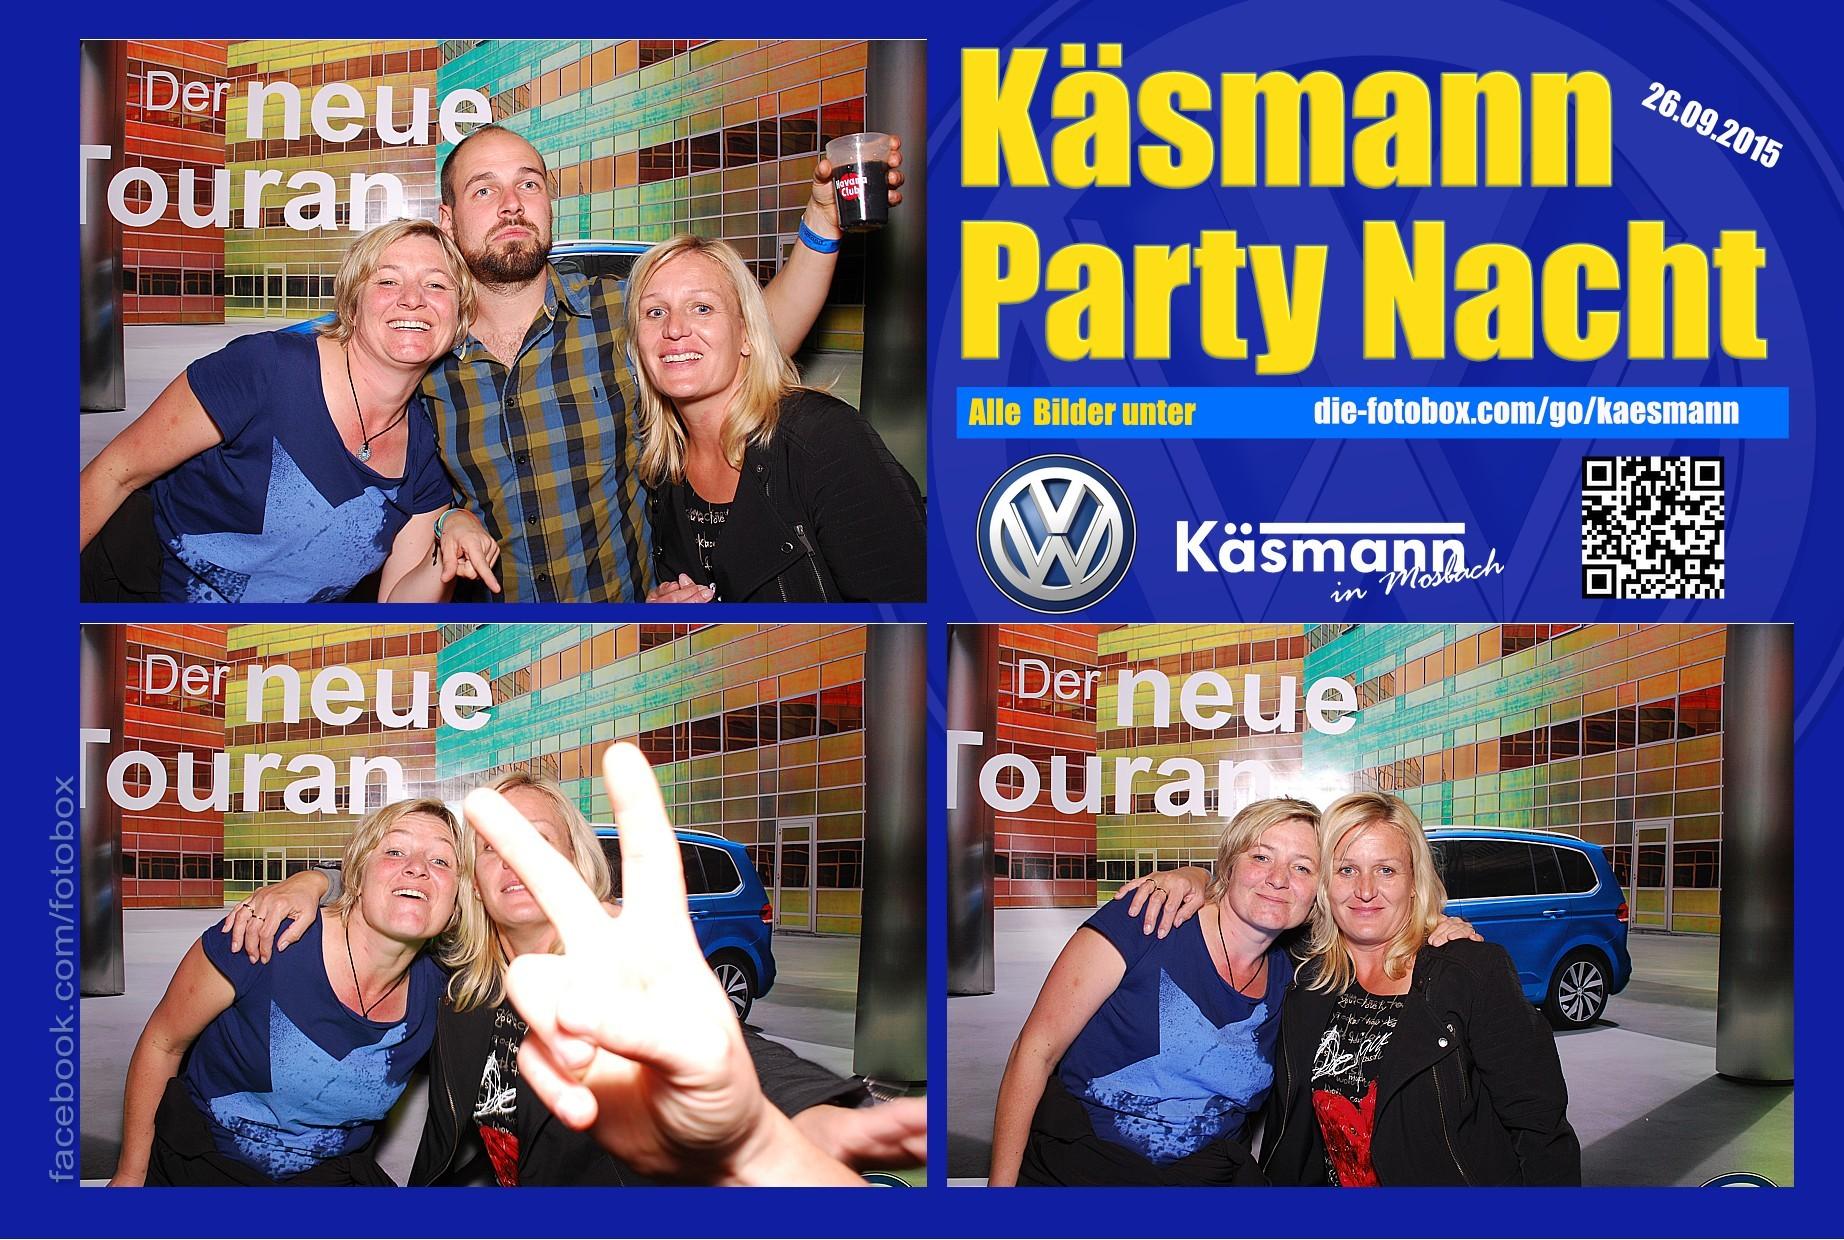 Käsmannparty 2015 - www.die-fotobox.com 00920